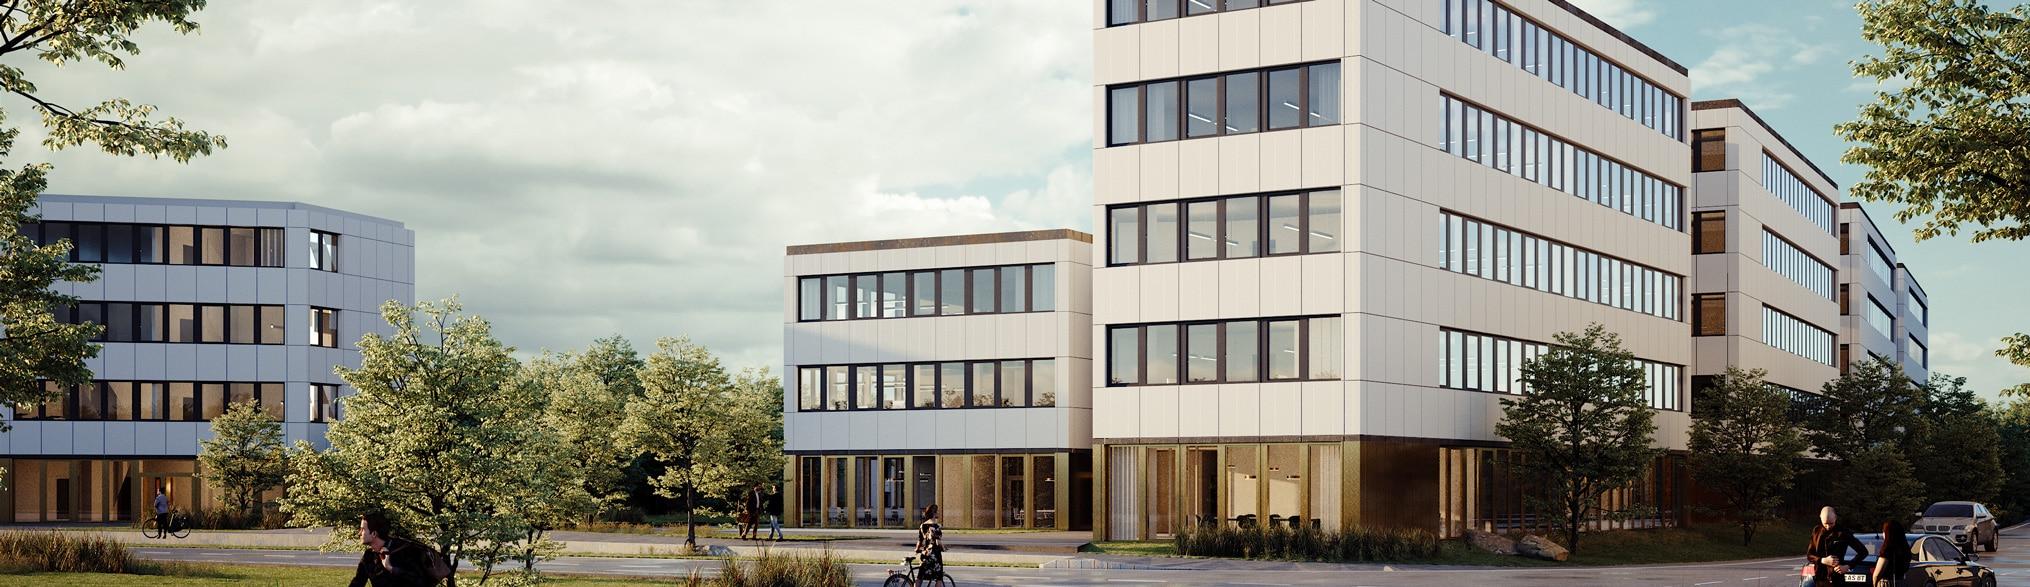 Neubauprojekt – Exklusive Büro-/ Technologieflächen in Dortmund